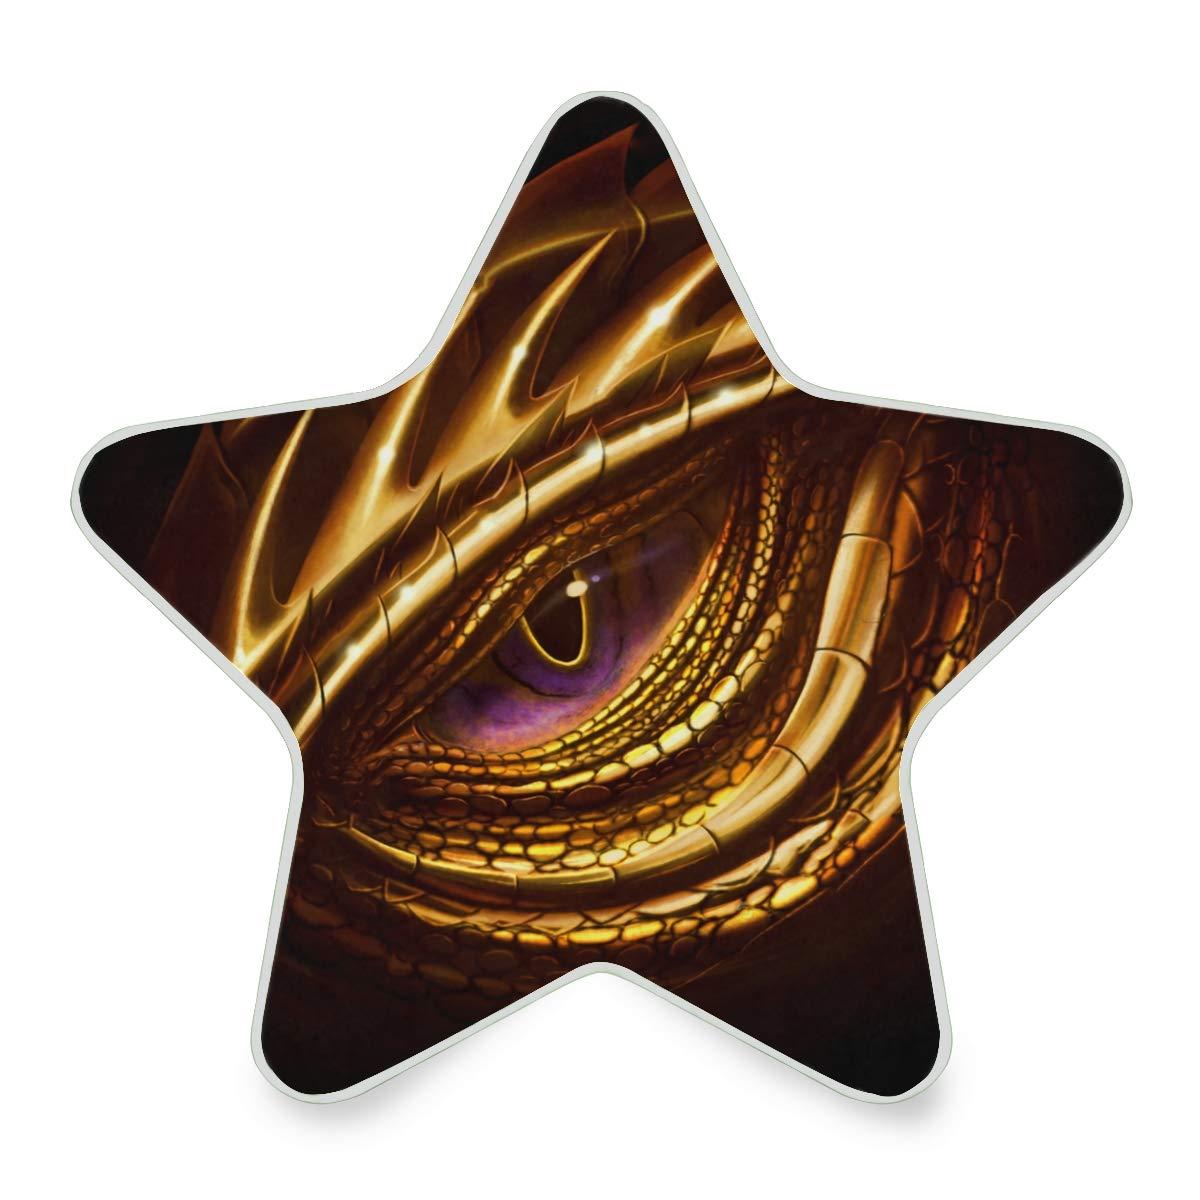 LED Night Light Eye of Golden Dragon Cool Amazing Nightlight Decorative Star Pentagram Shaped Plug in for Kids Baby Girls Boys Adults Room